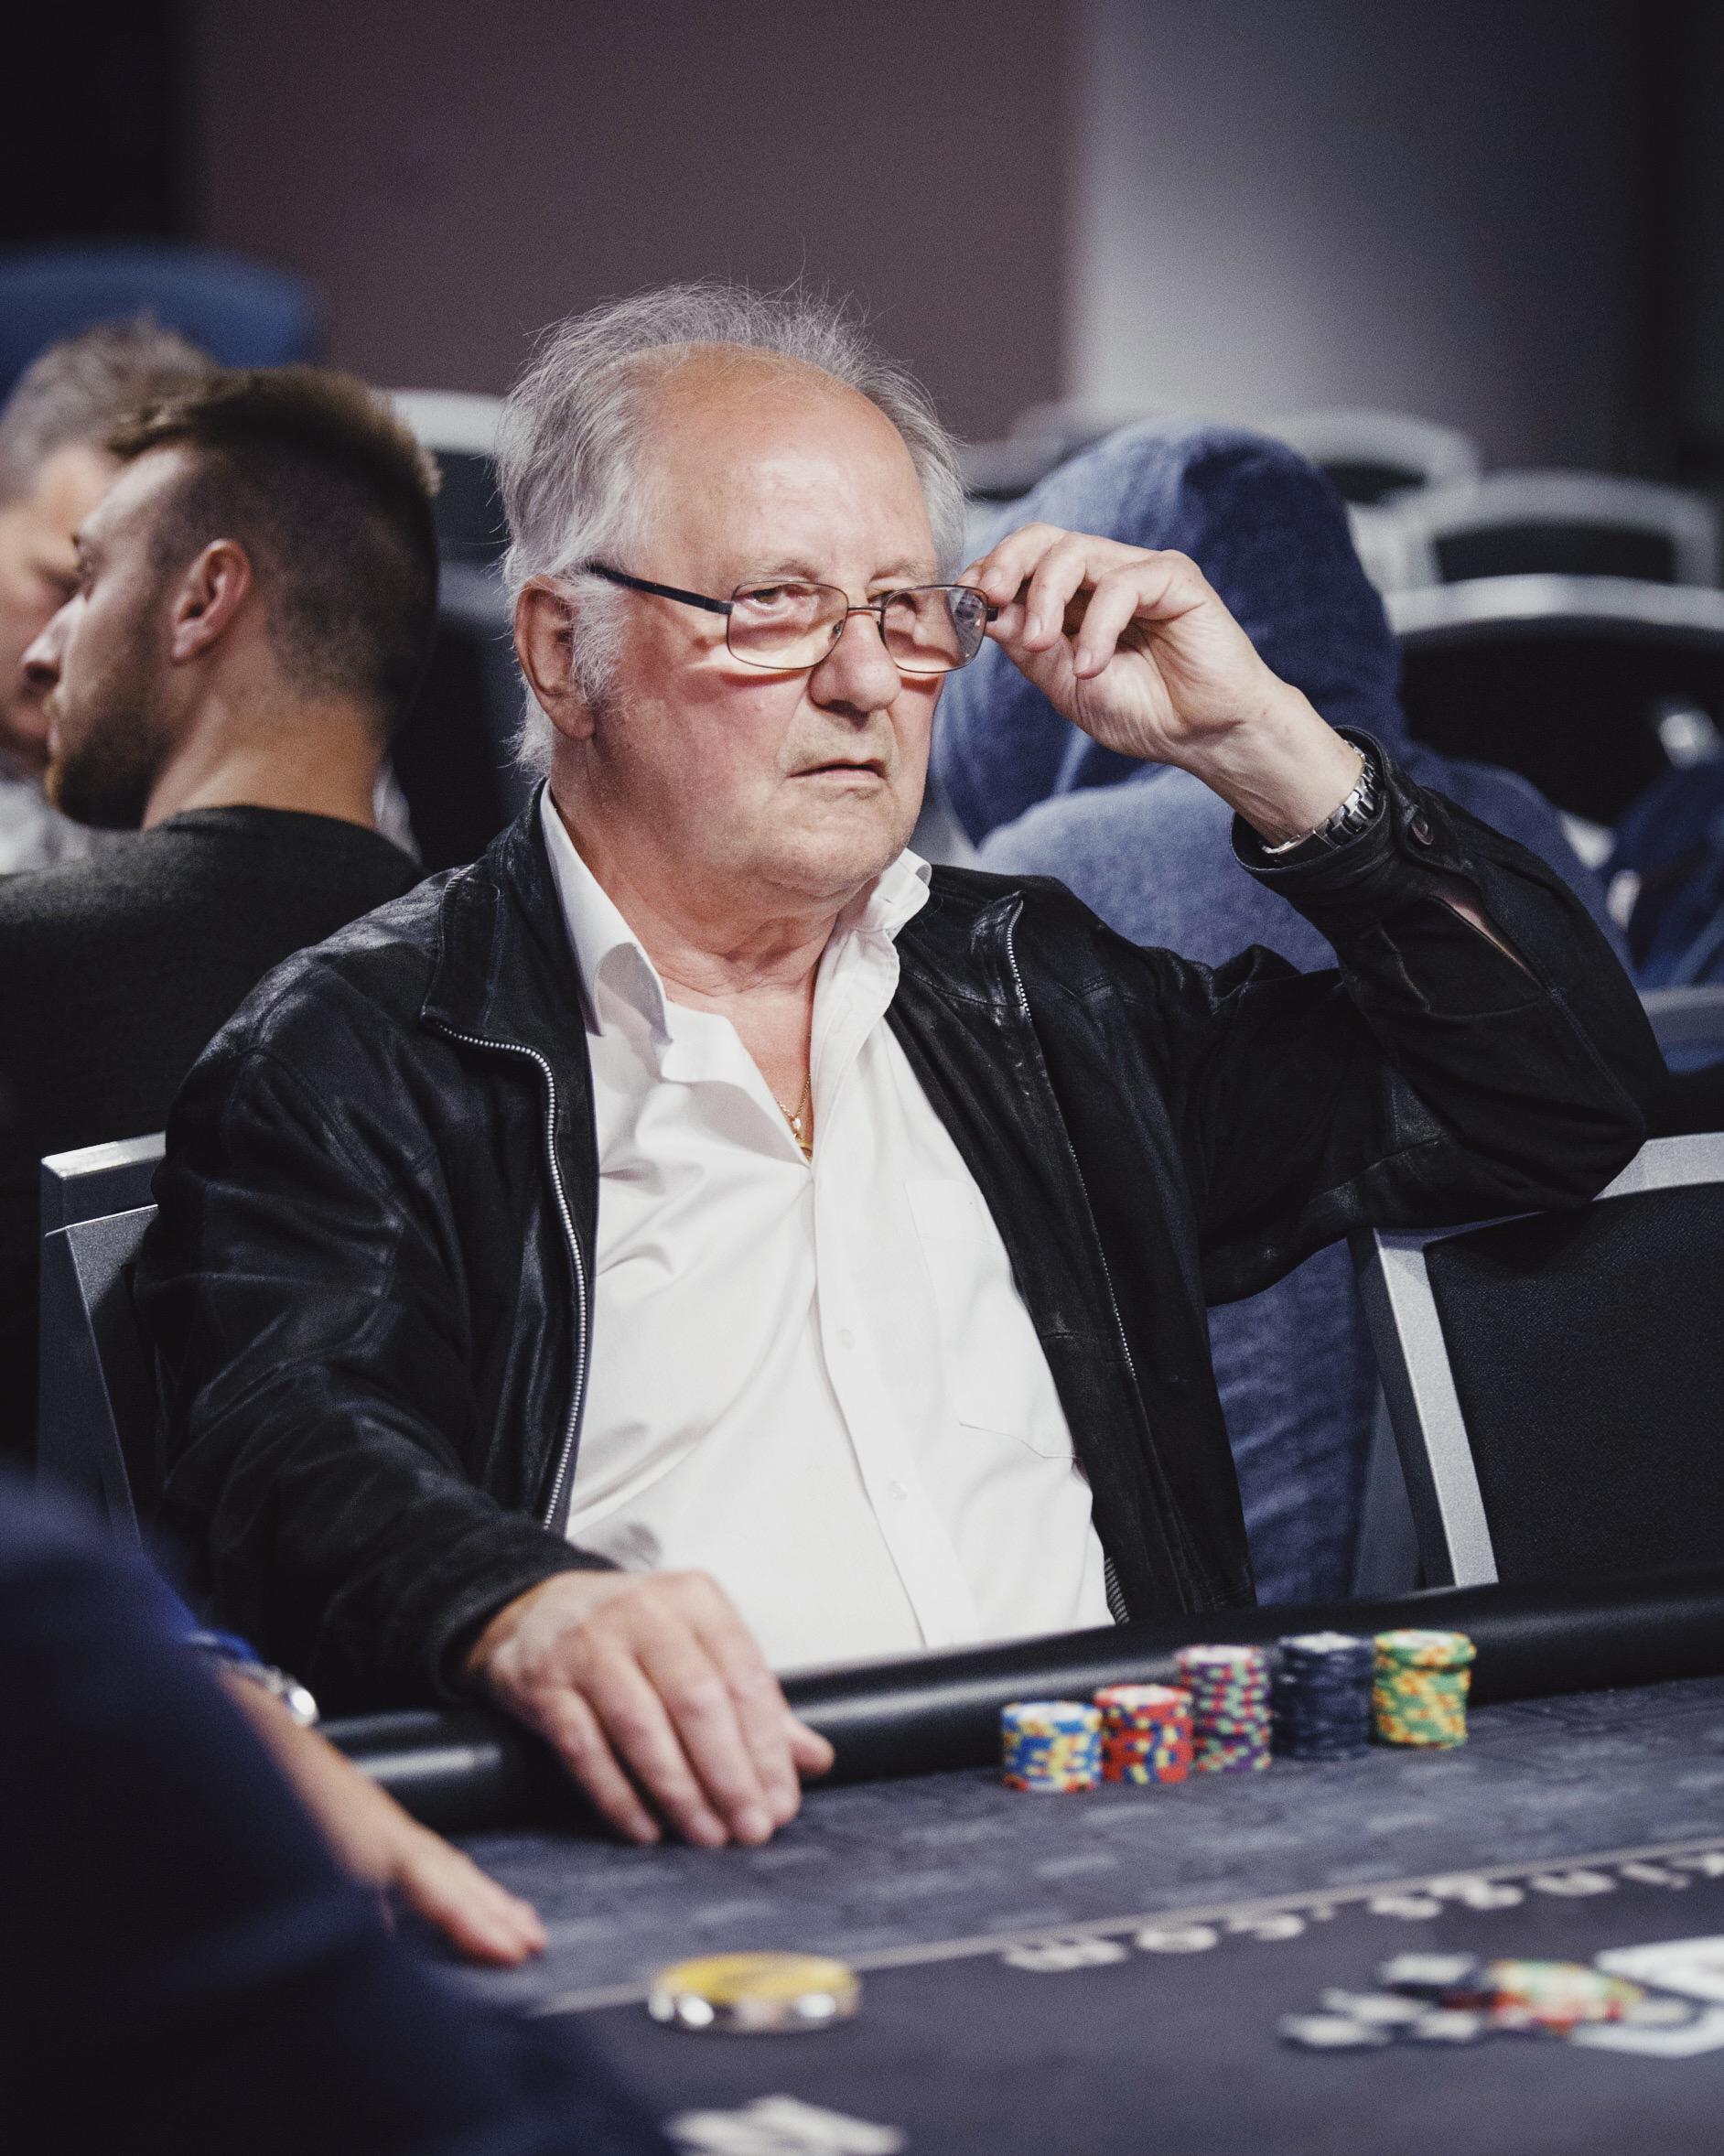 polina-shubkina-poker-033.JPG